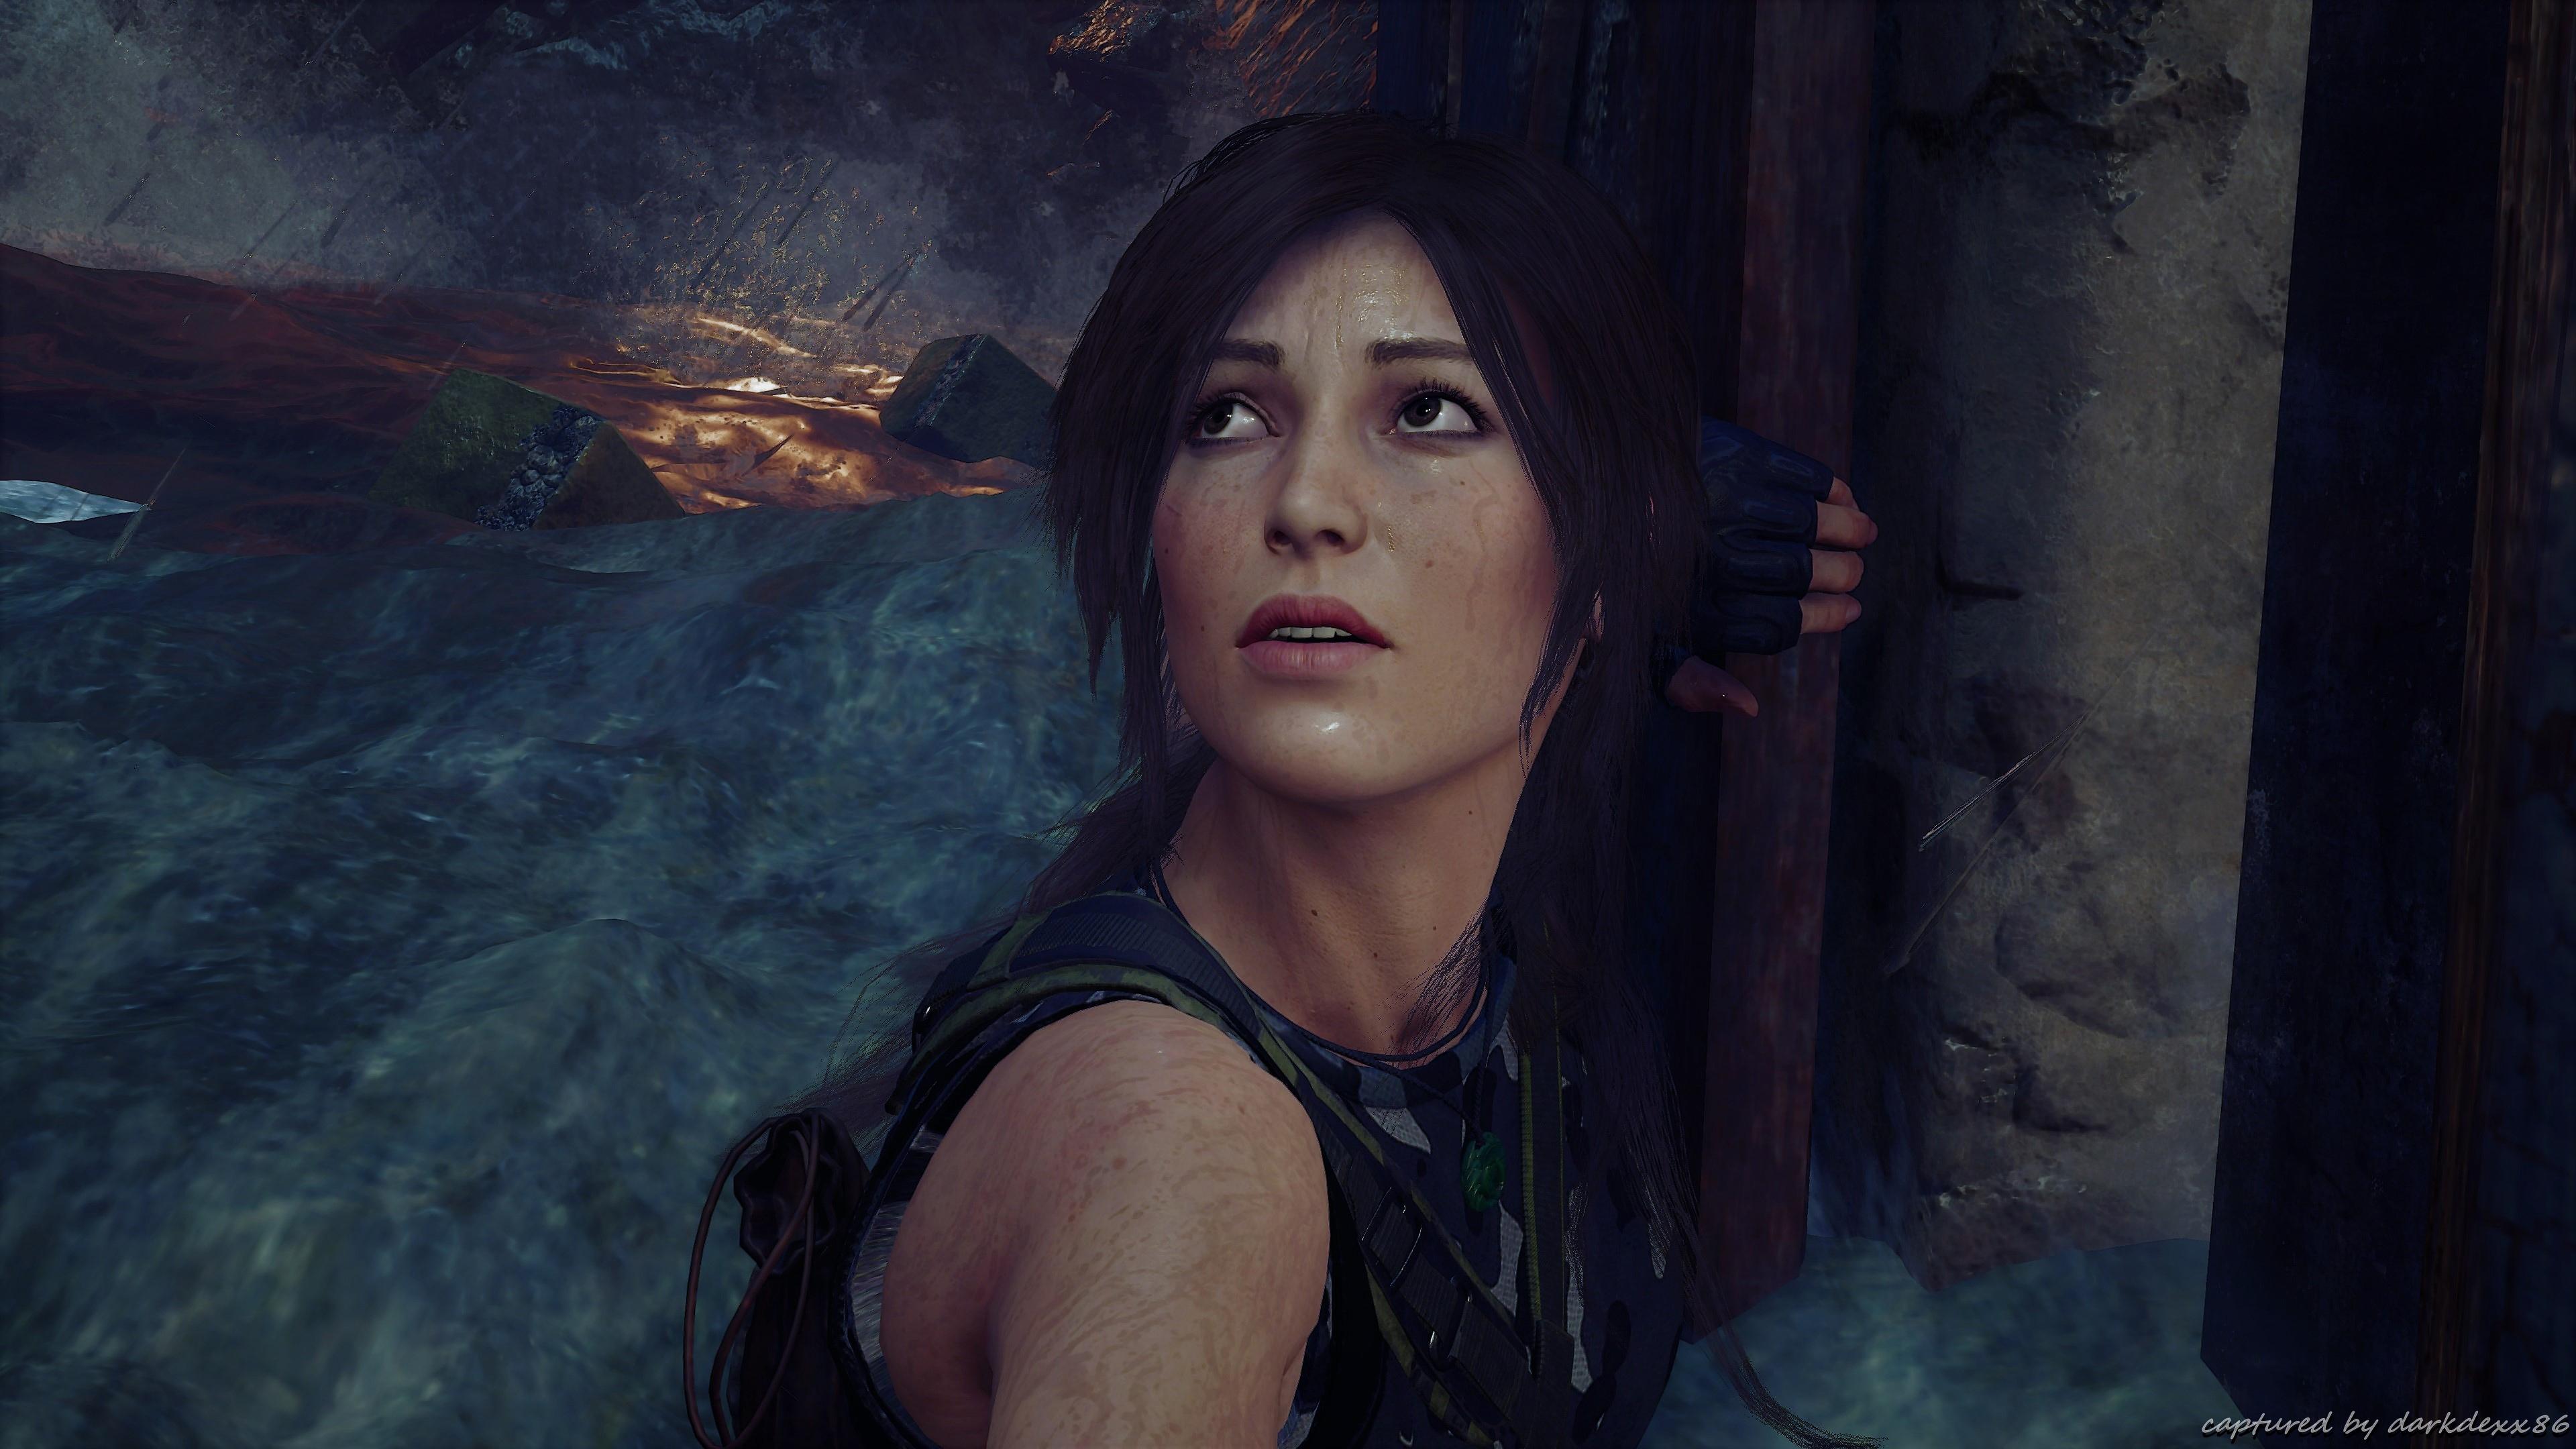 Wallpaper 4k Shadow Of The Tomb Raider Lara Croft 4k 2018 Games